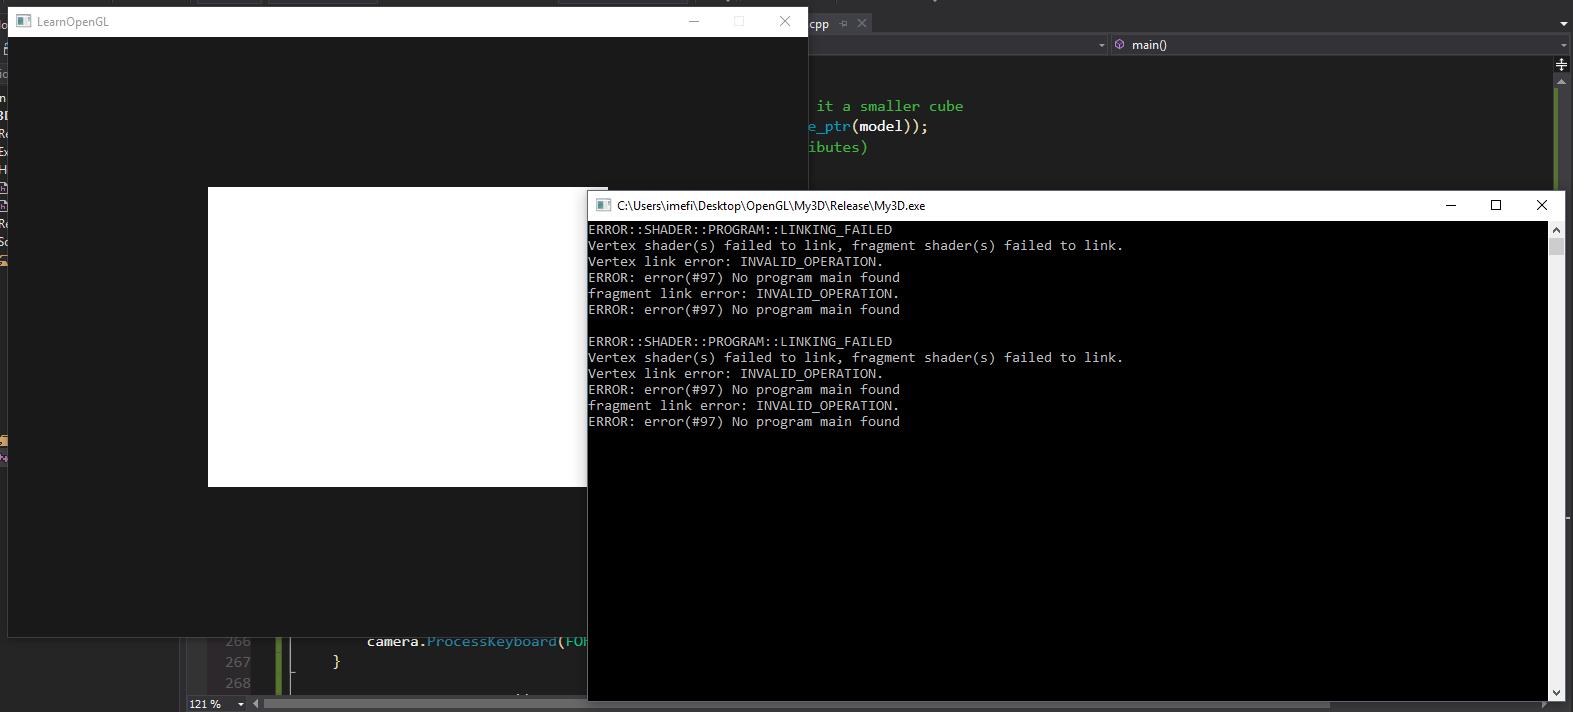 OpenGL Debug and release